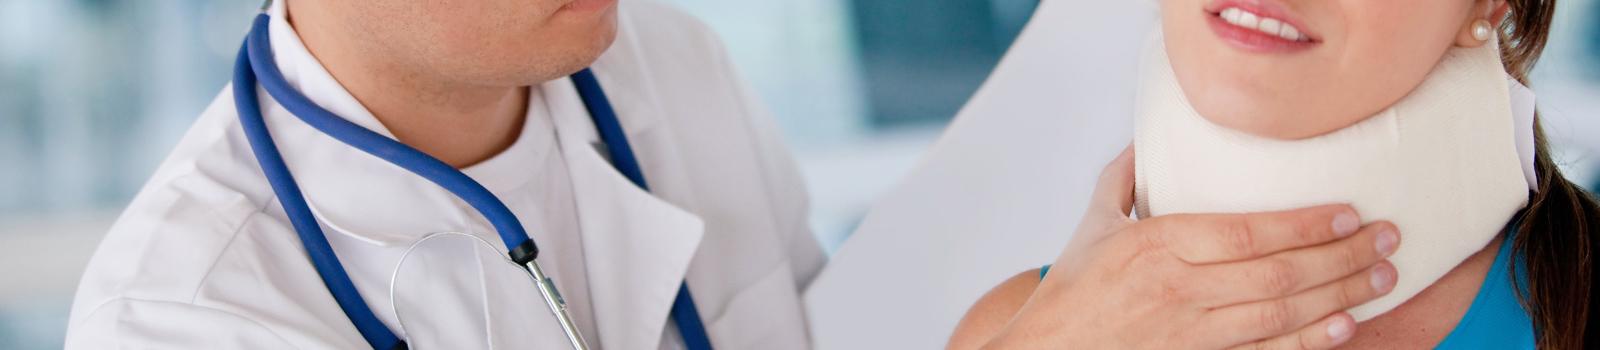 Fisioterapia Traumatológica y Ortopédica